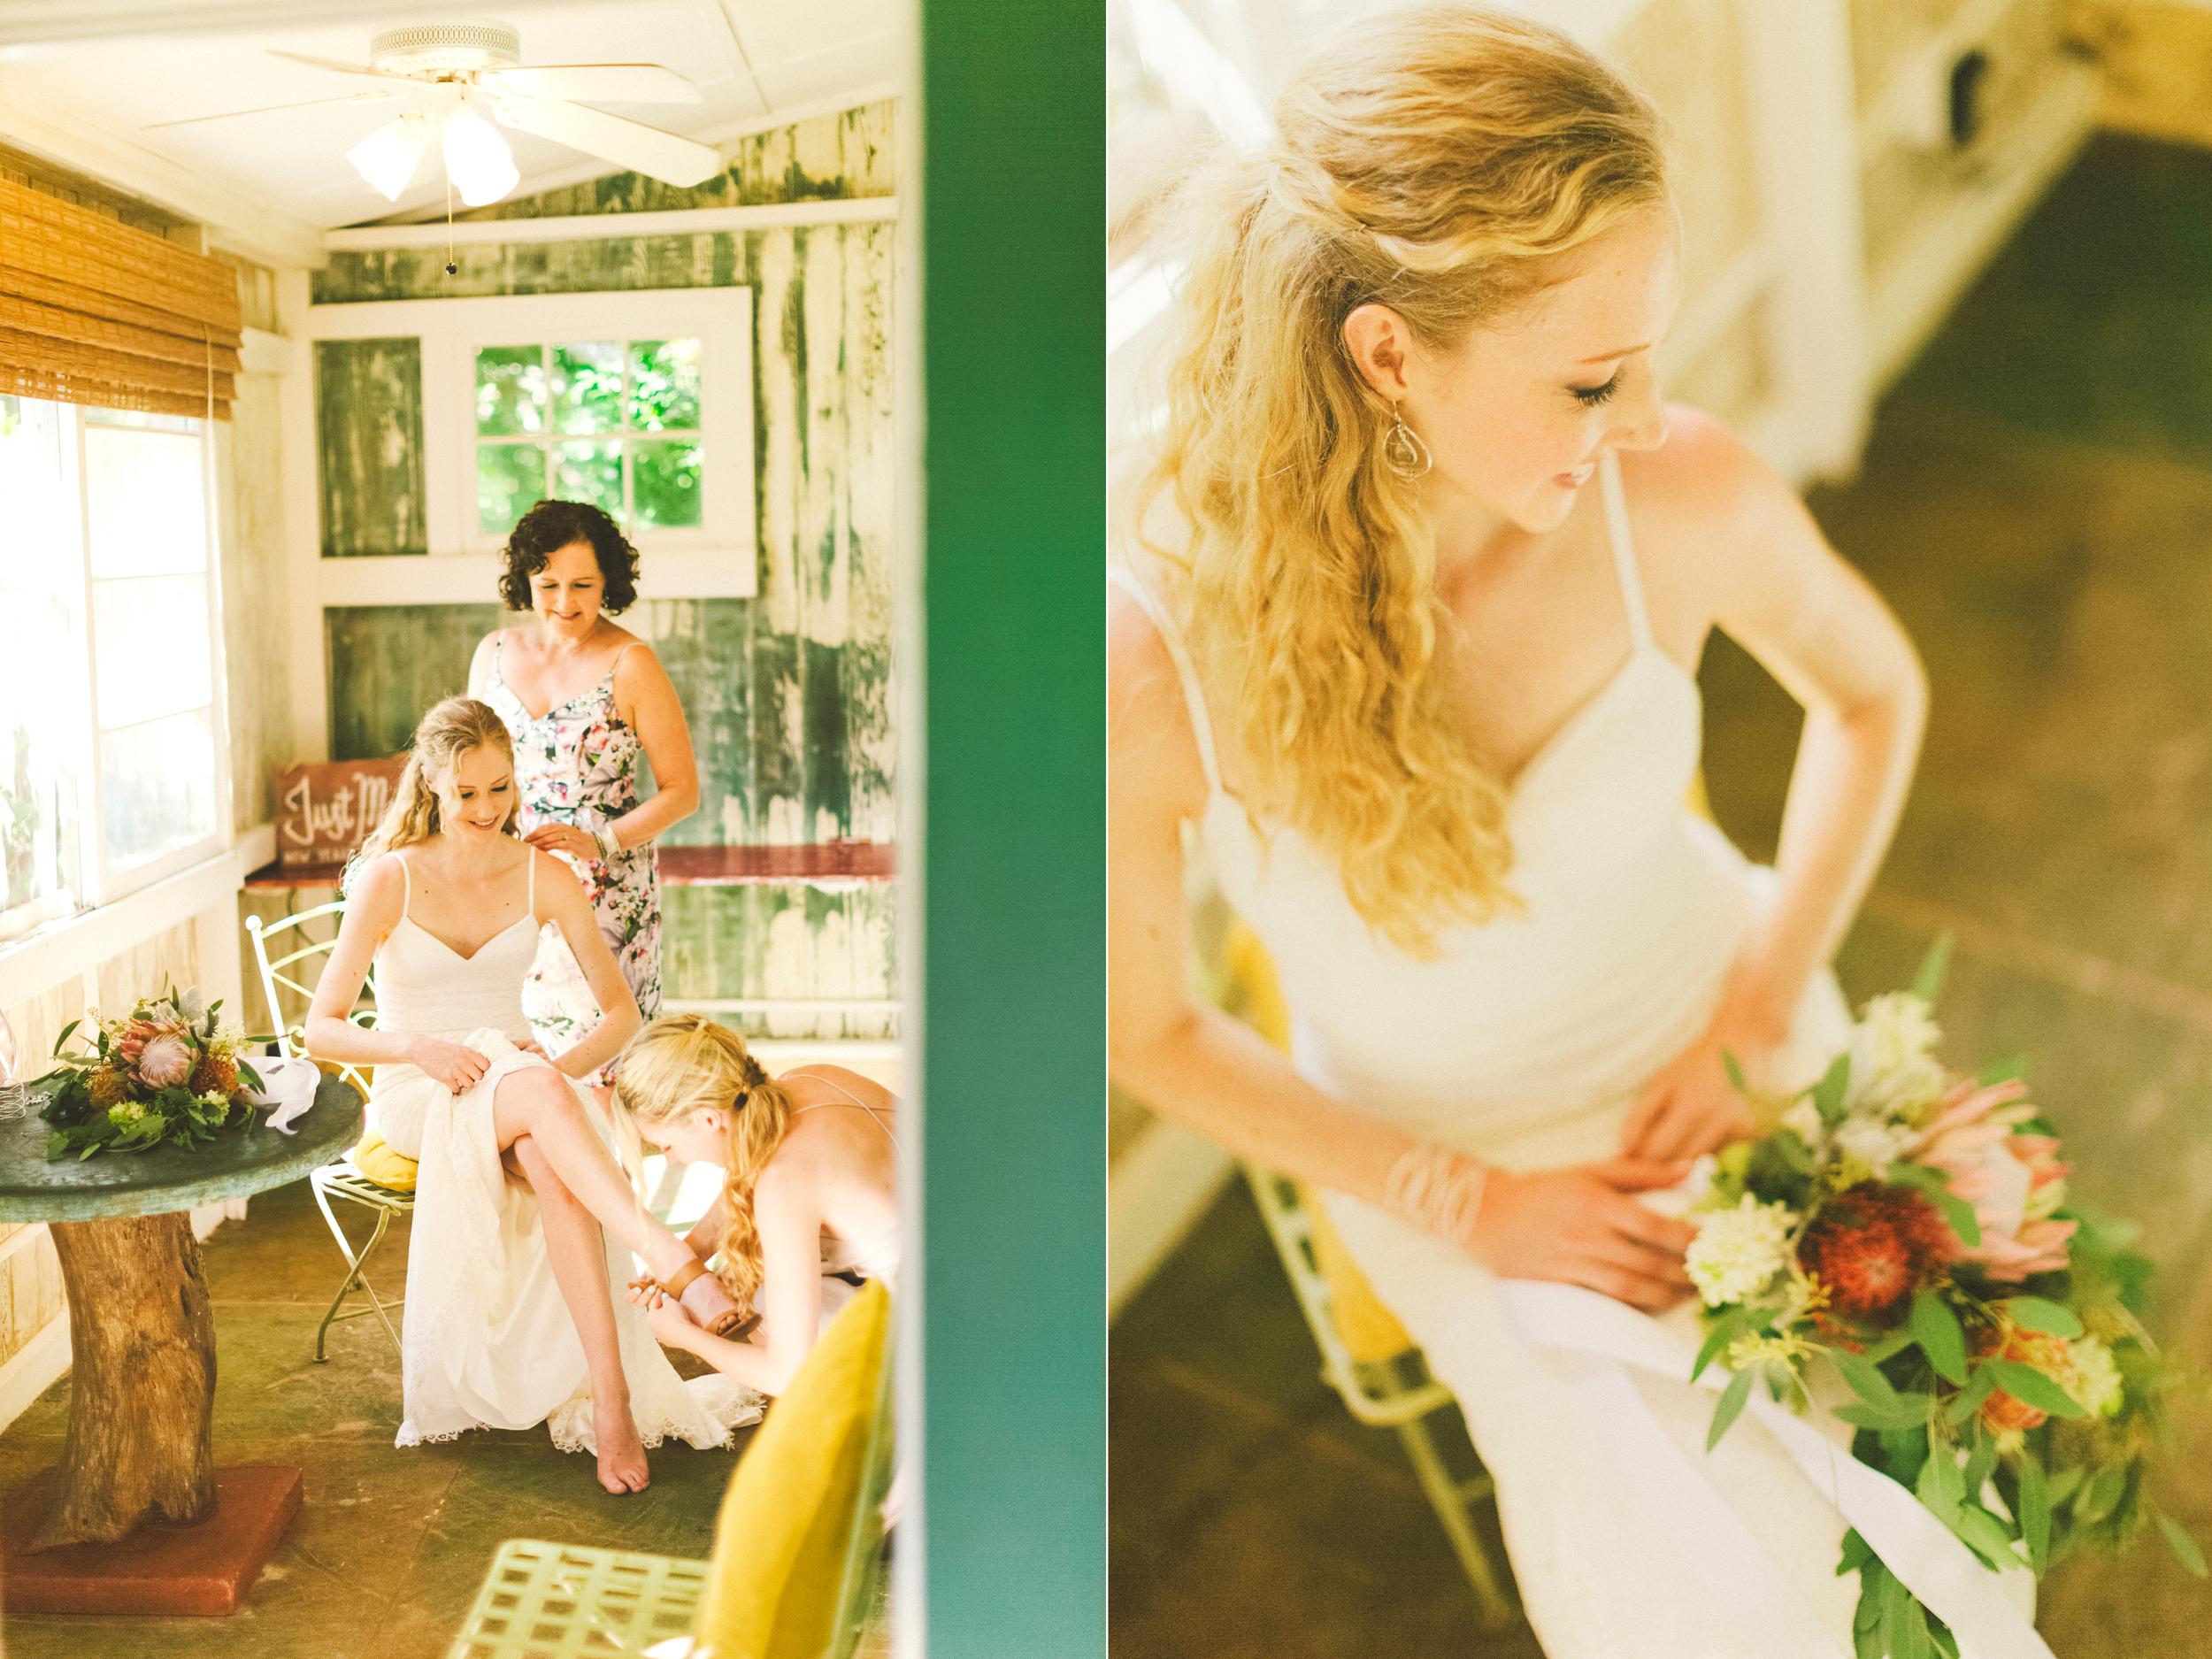 angie-diaz-photography-maui-wedding-30.jpg